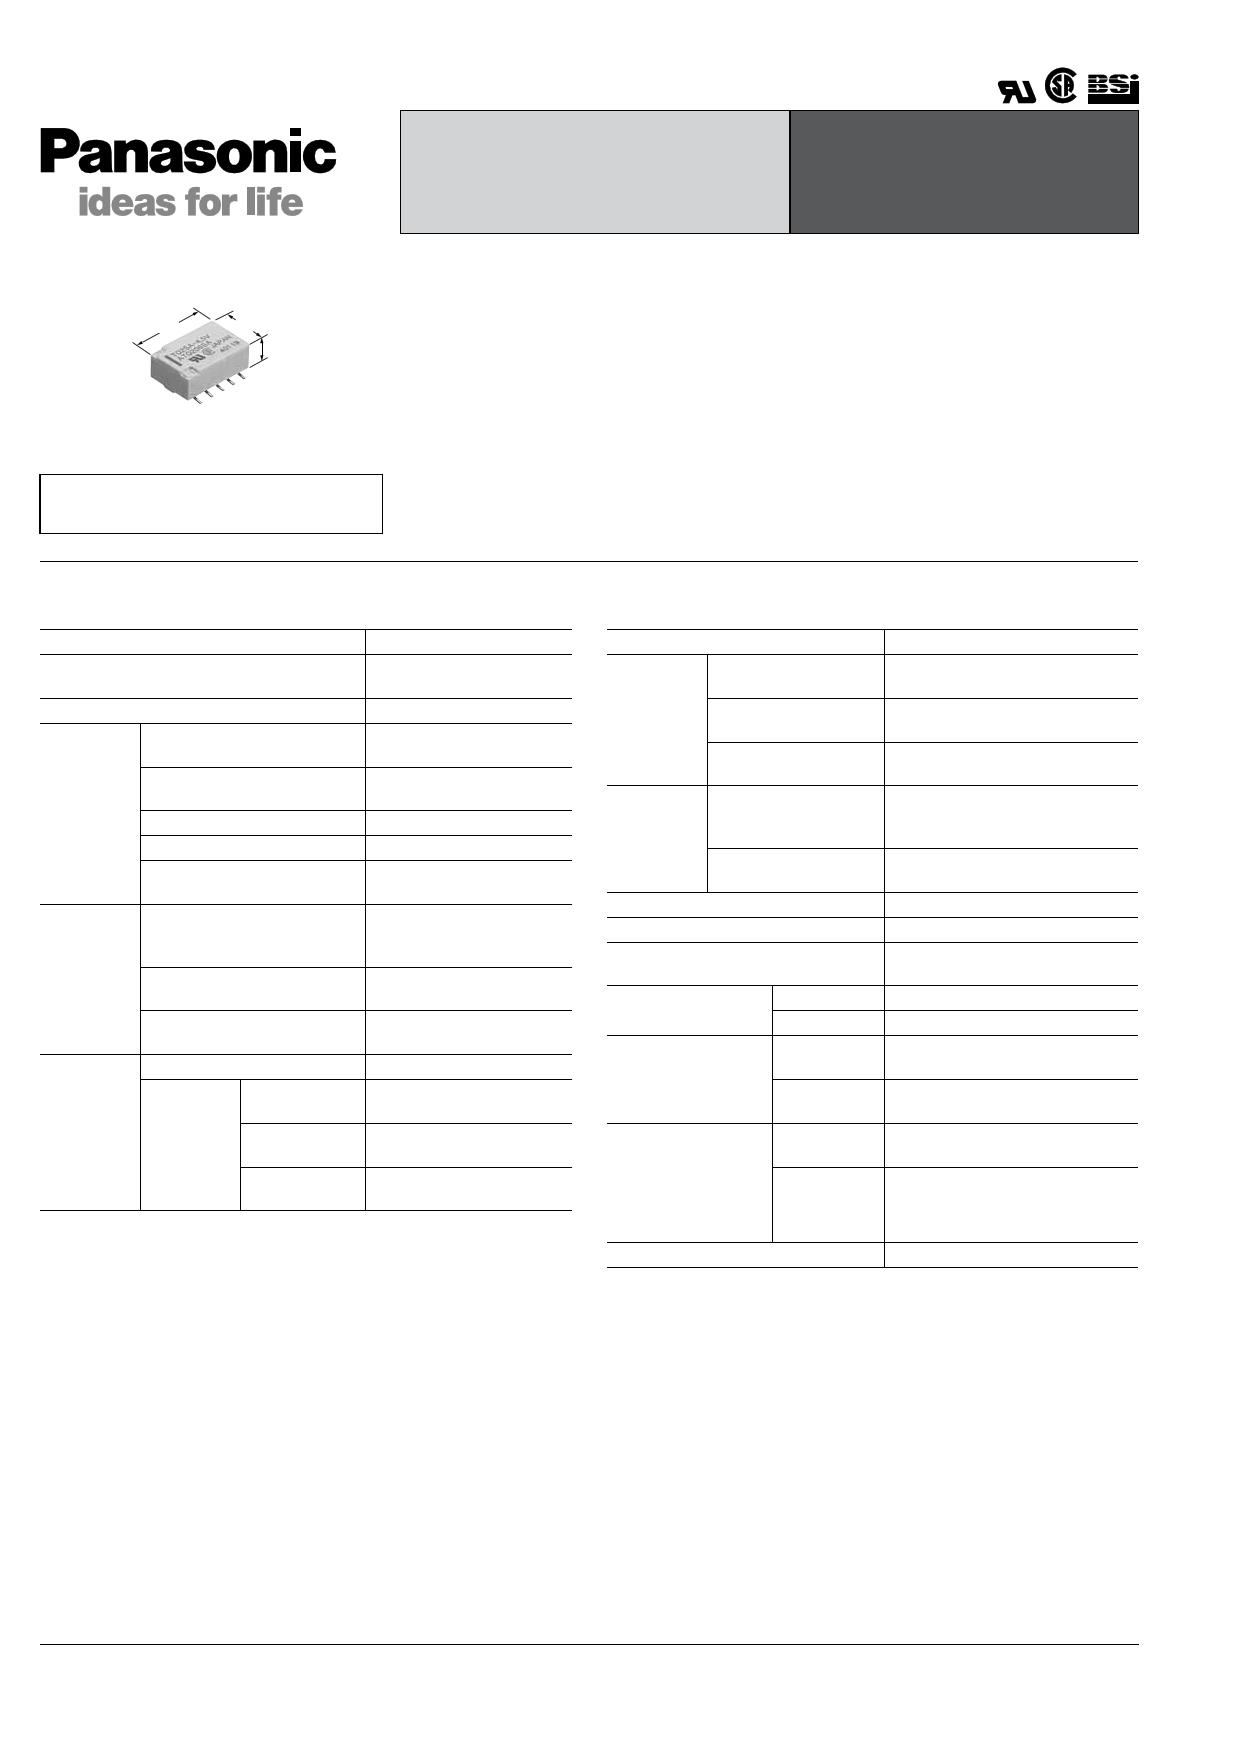 TQ2SL-L2-3V 데이터시트 및 TQ2SL-L2-3V PDF